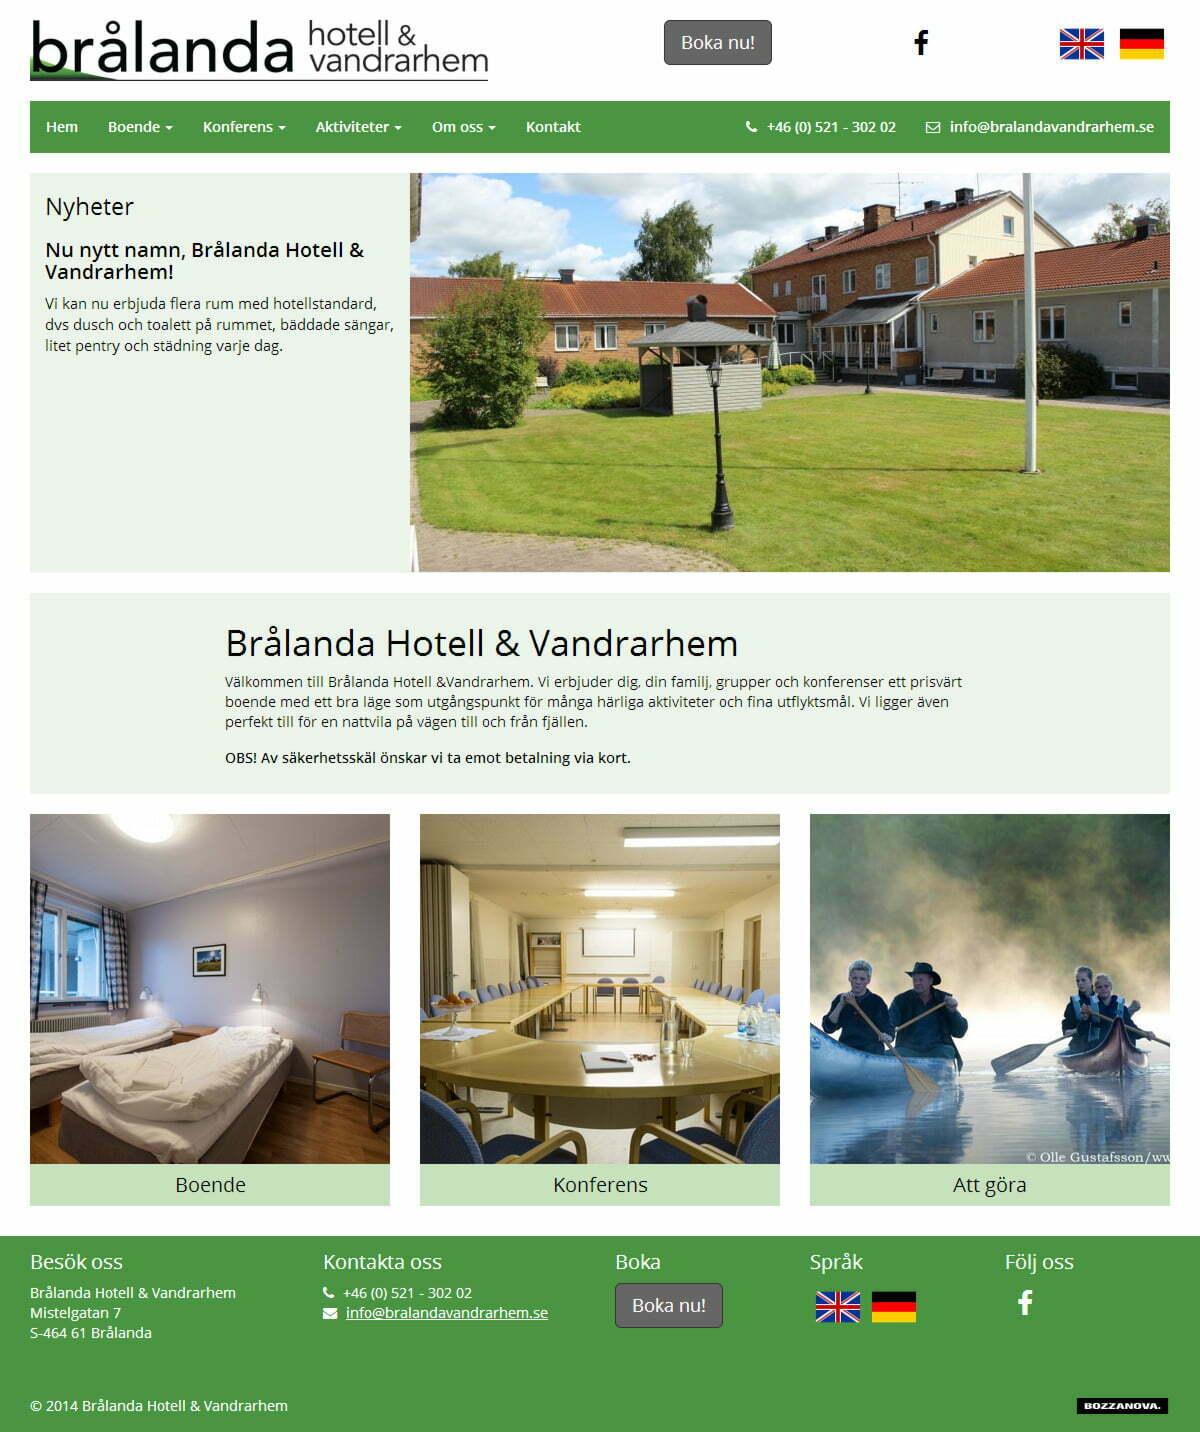 Brålanda Hotell & Vandrarhem: ny hemsida